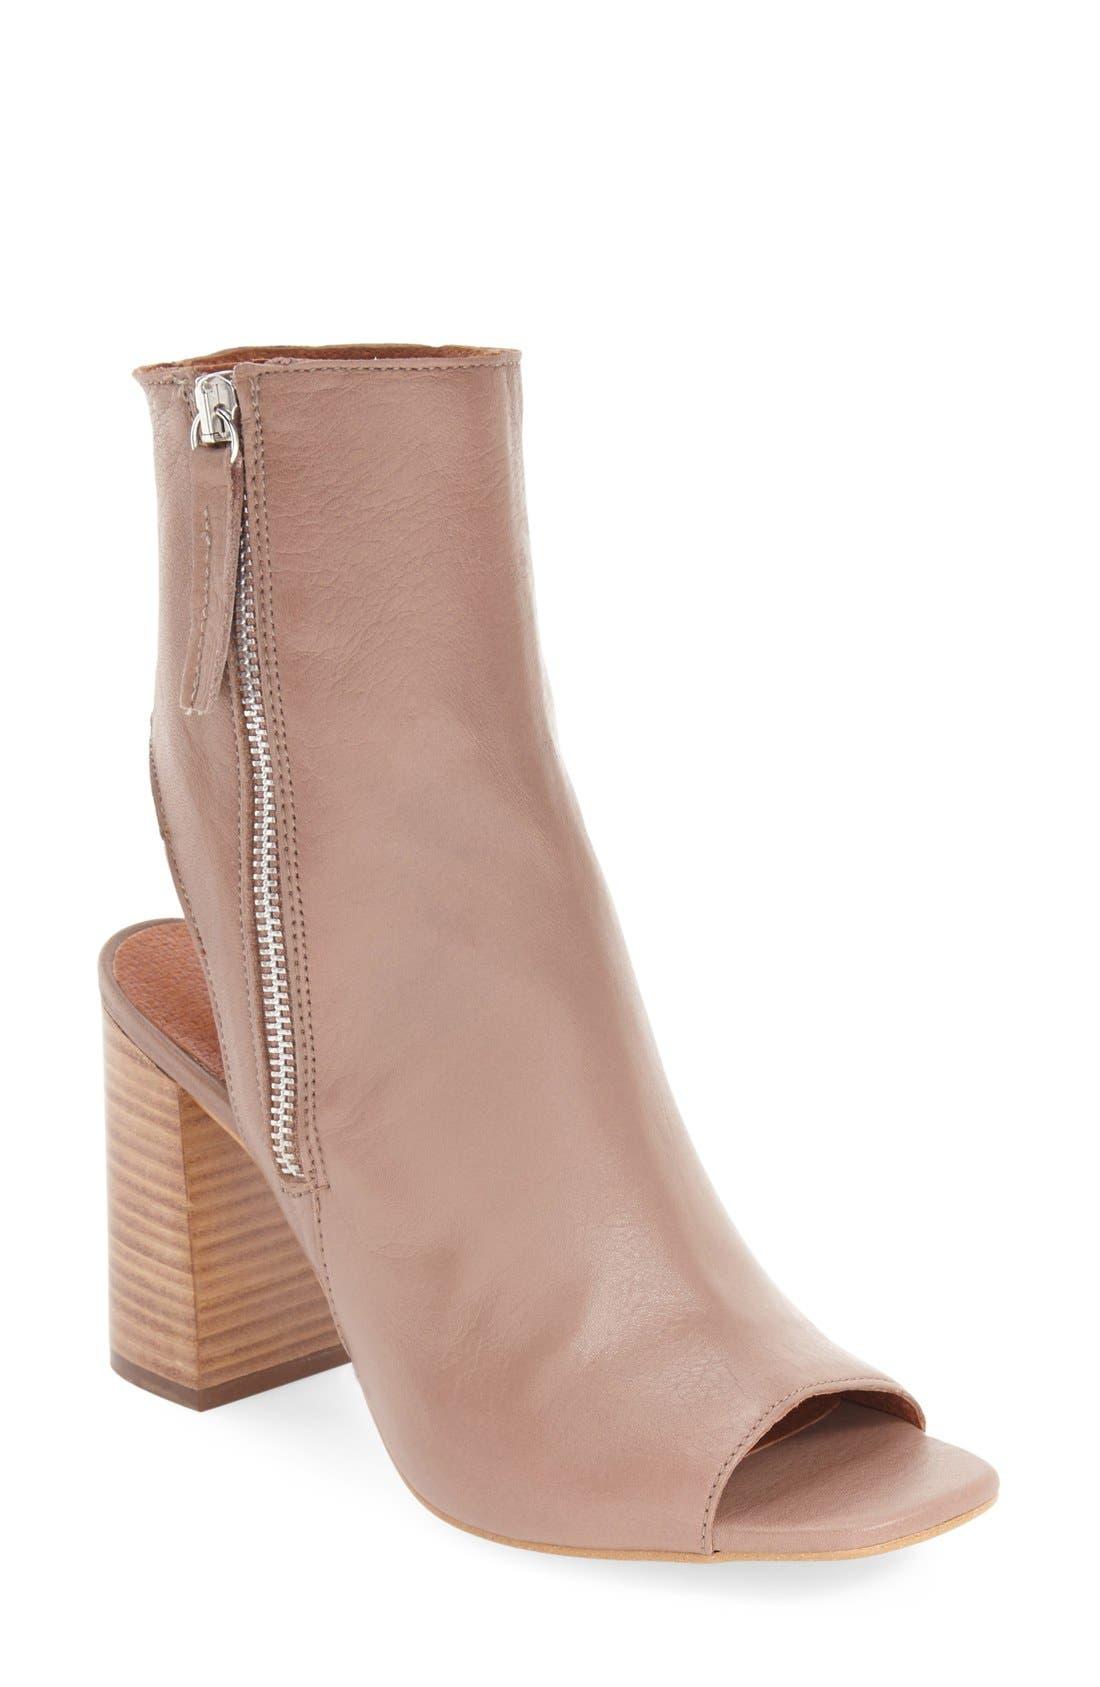 Main Image - Topshop 'Home' Peep Toe Boot (Women)